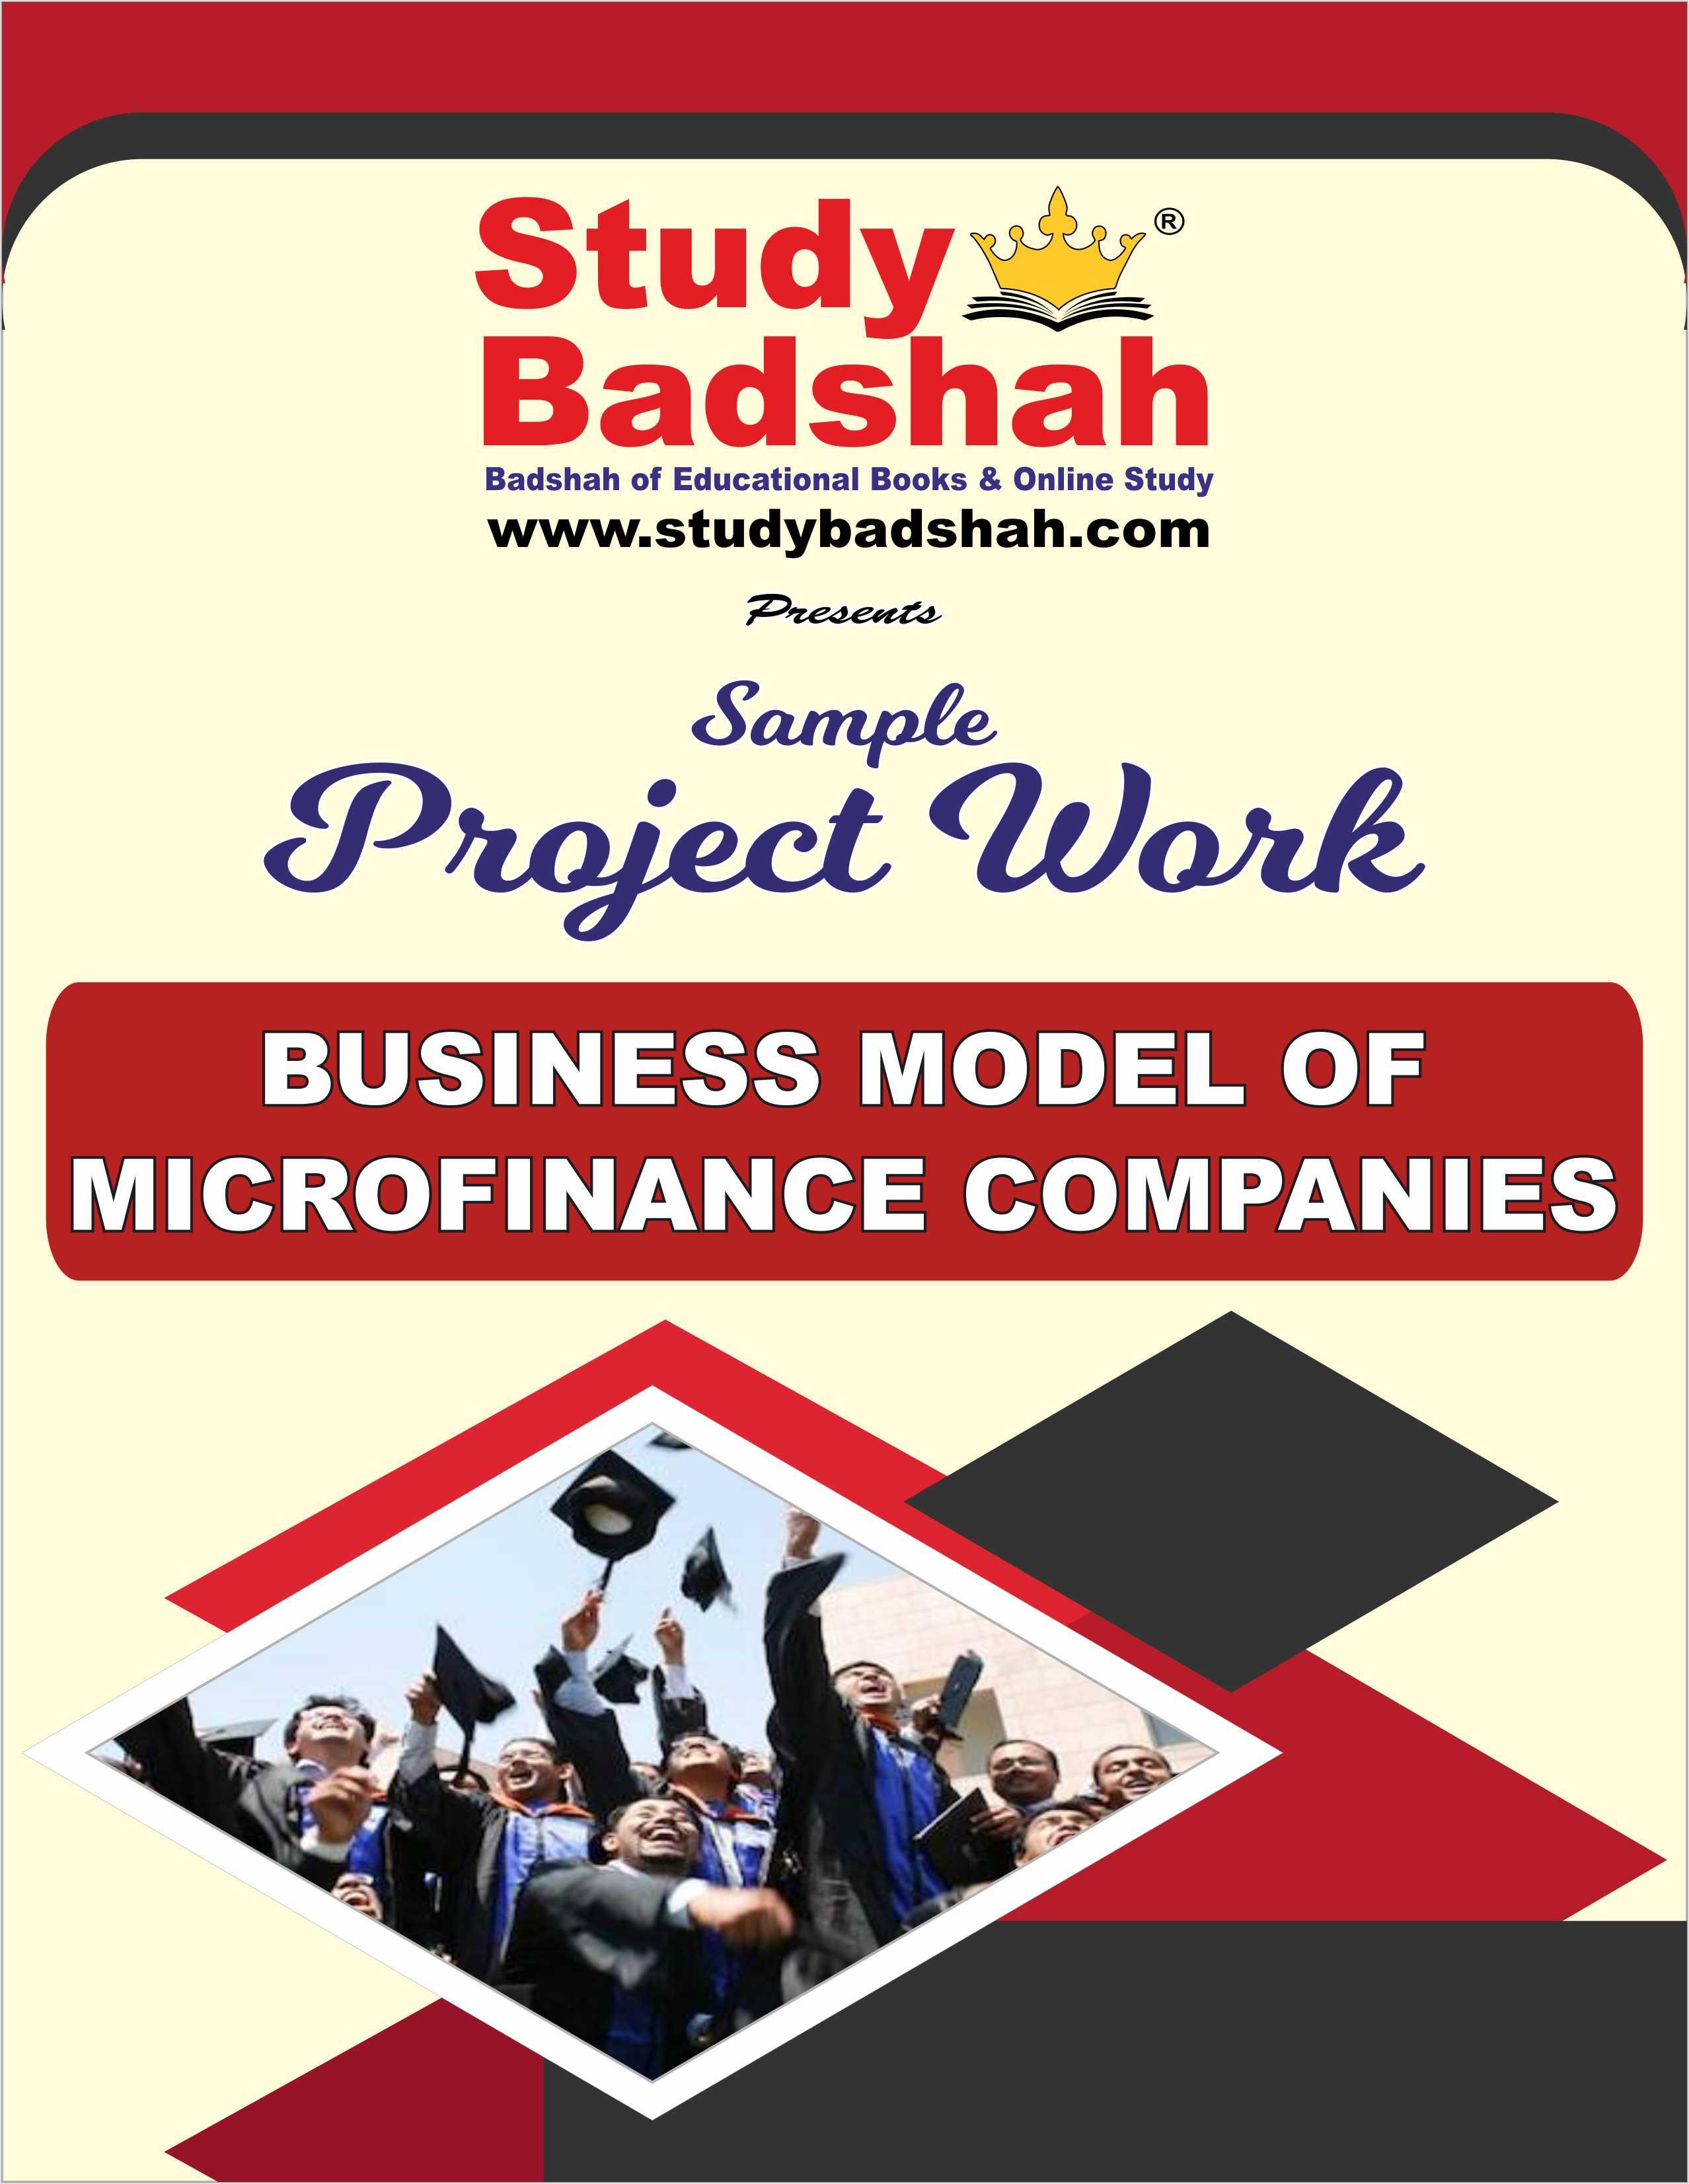 Business Model of Microfinance Companies